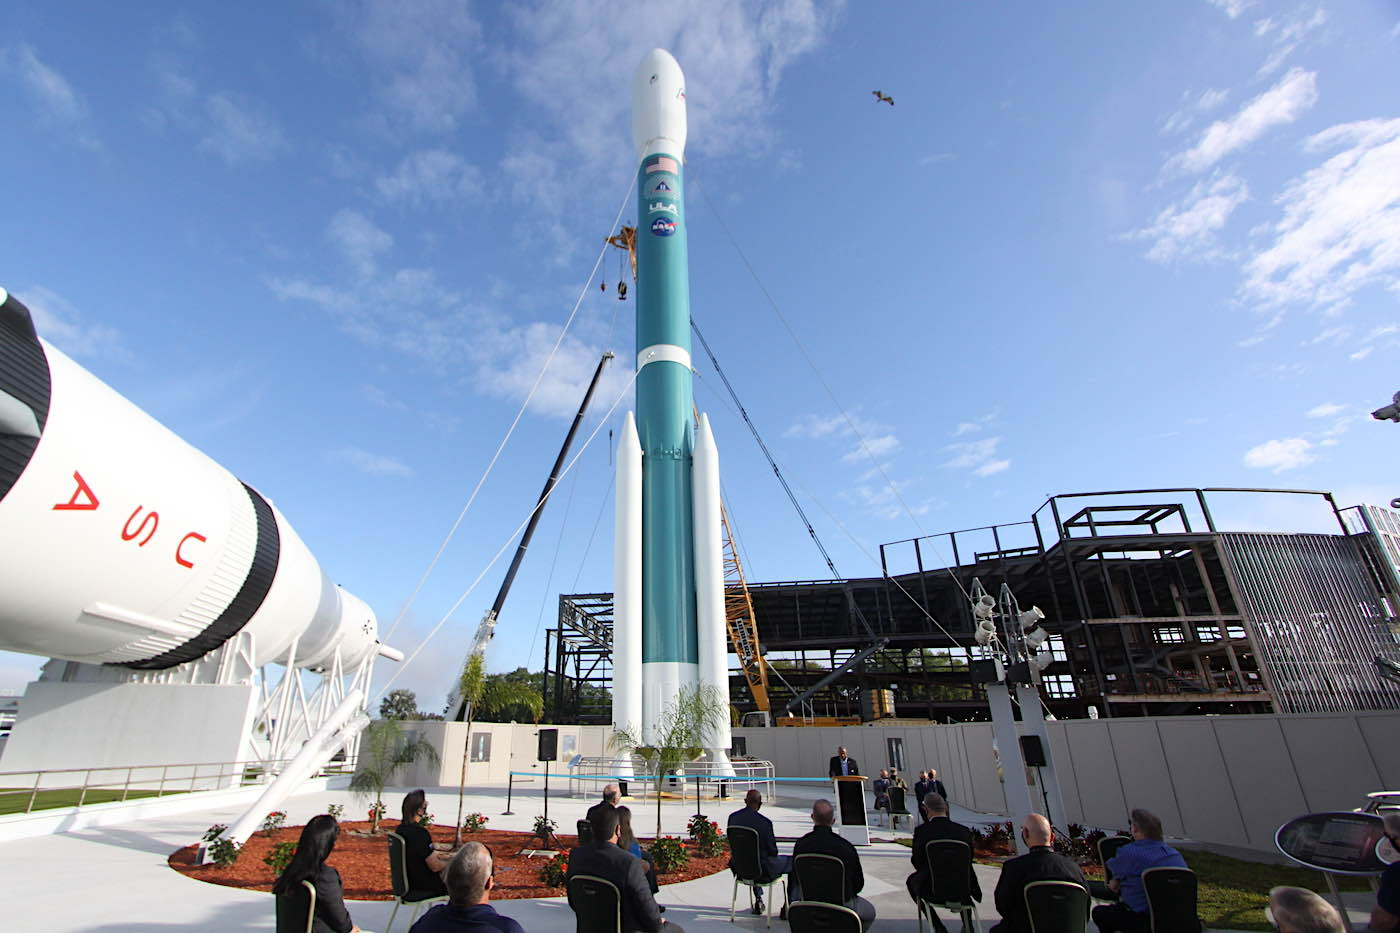 - d2 kscvc 1 - Delta 2 rocket exhibit opens at Kennedy Space Center – Spaceflight Now